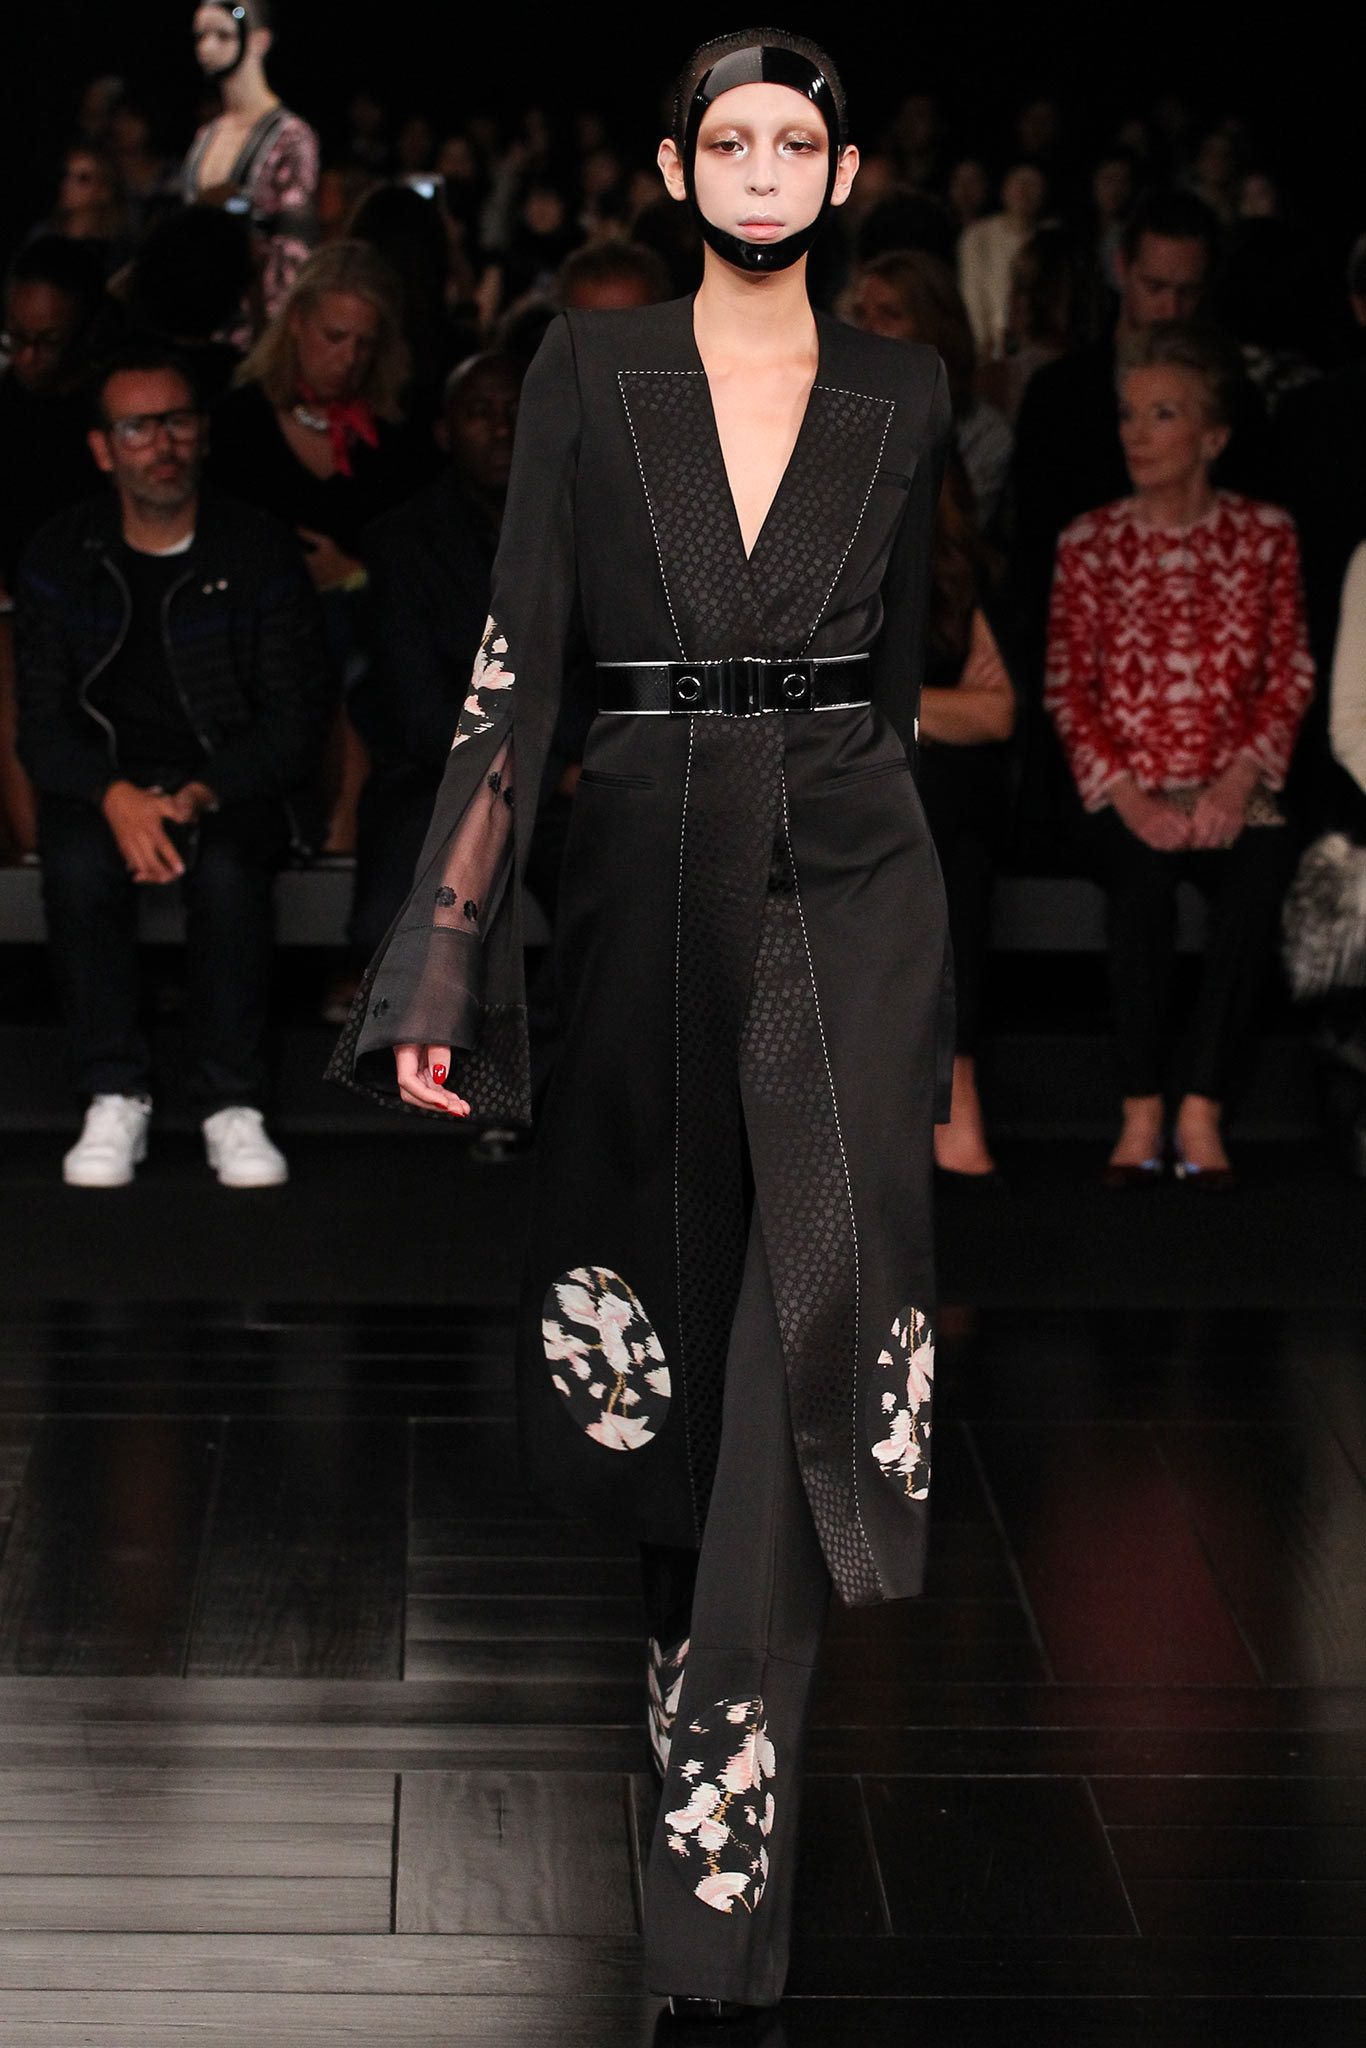 Alexander McQueen Spring 2015 Ready-to-Wear Fashion Show